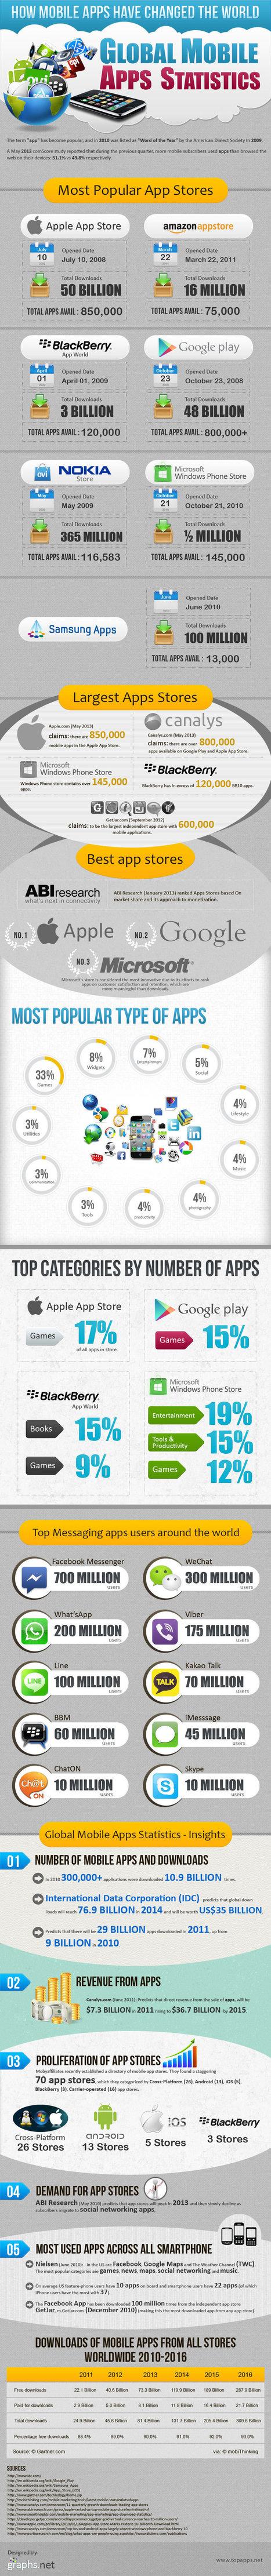 Global Mobile Apps Statistics (infographic) | Weblearner | Scoop.it